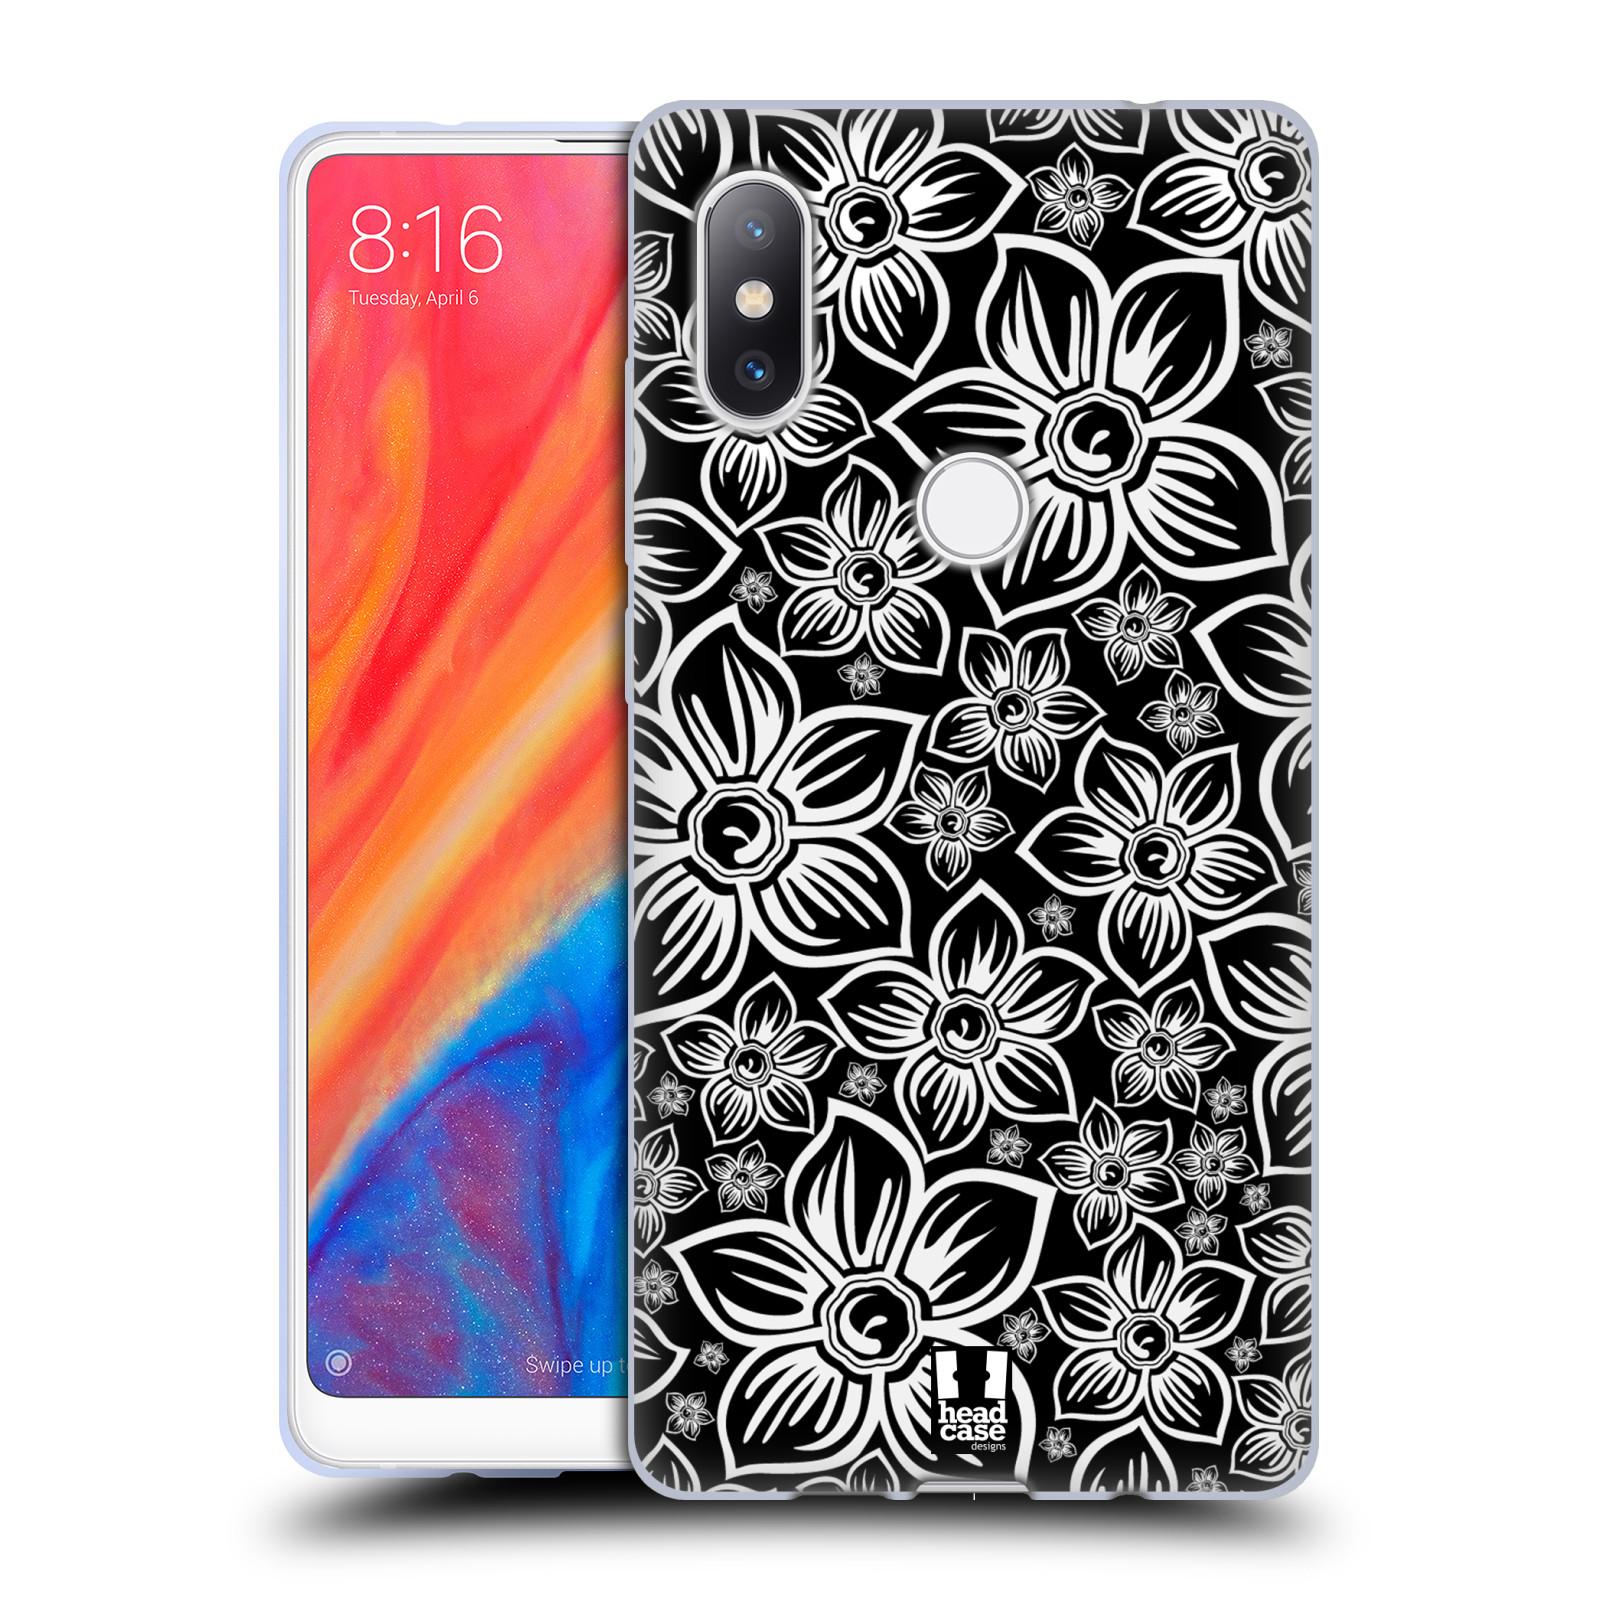 Silikonové pouzdro na mobil Xiaomi Mi Mix 2S - Head Case - FLORAL DAISY